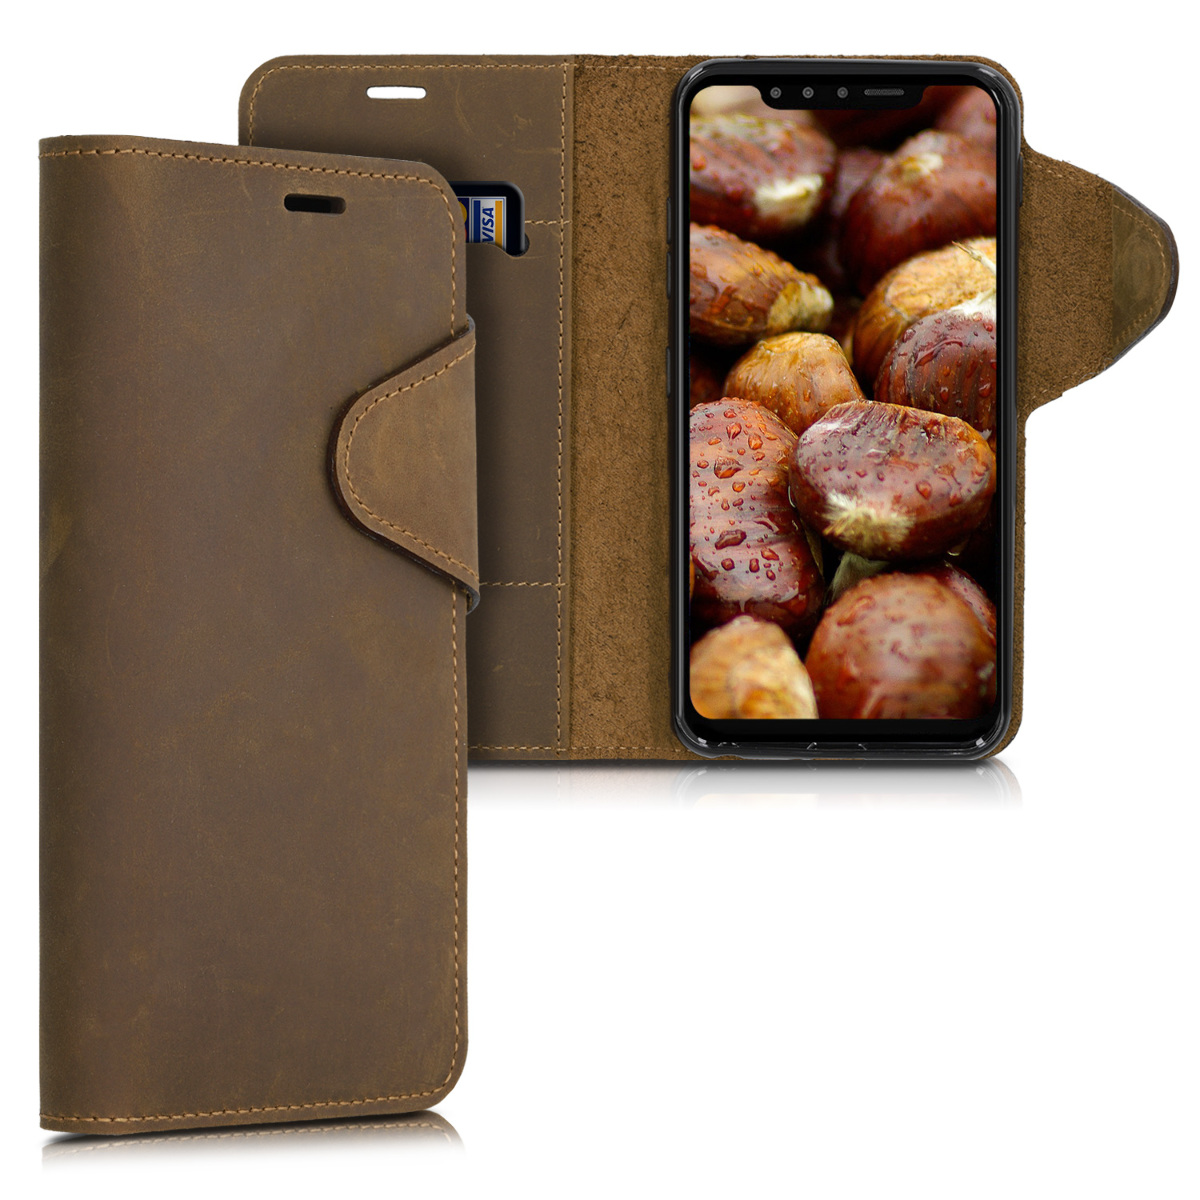 Kalibri Δερμάτινη Suede Θήκη - Πορτοφόλι LG G8s ThinQ - Brown (48075.05)